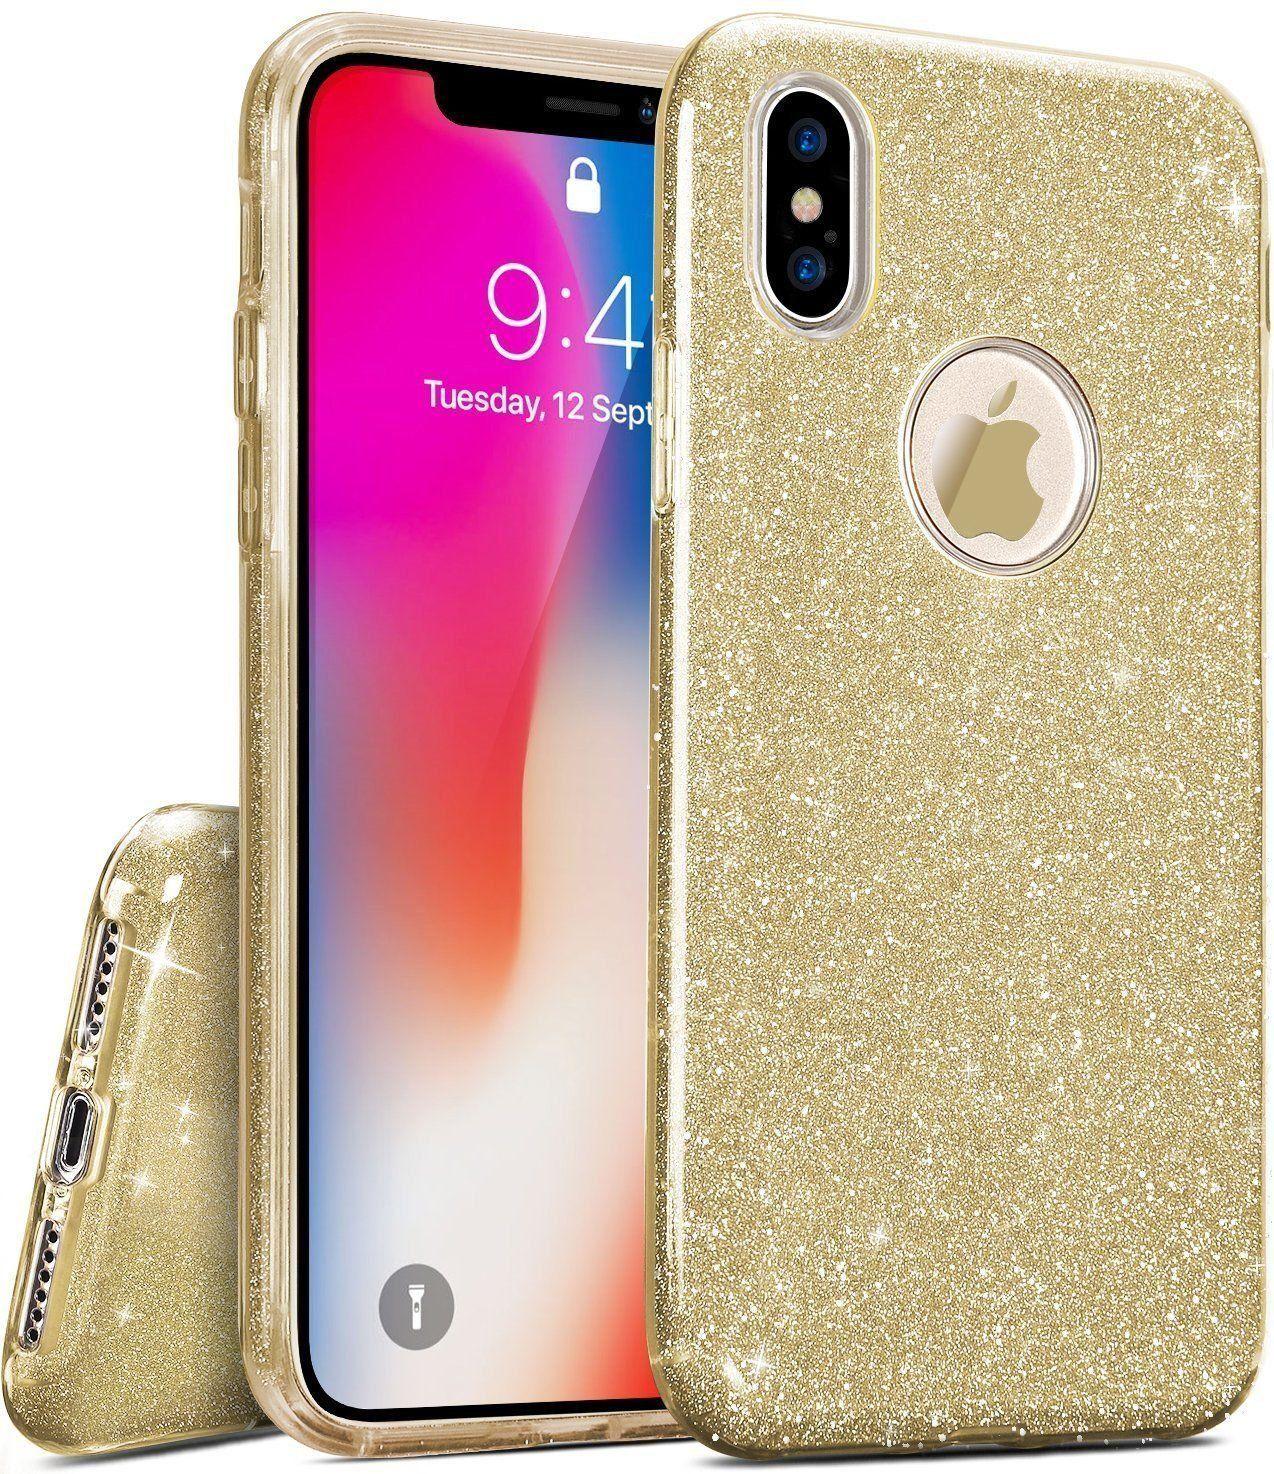 Apple Iphone X 2017 Release 10 Case Gadgetfarmer Slim Xr Spigen Carbon Fiber Softcase Rugged Armor Casing Soft Shinning